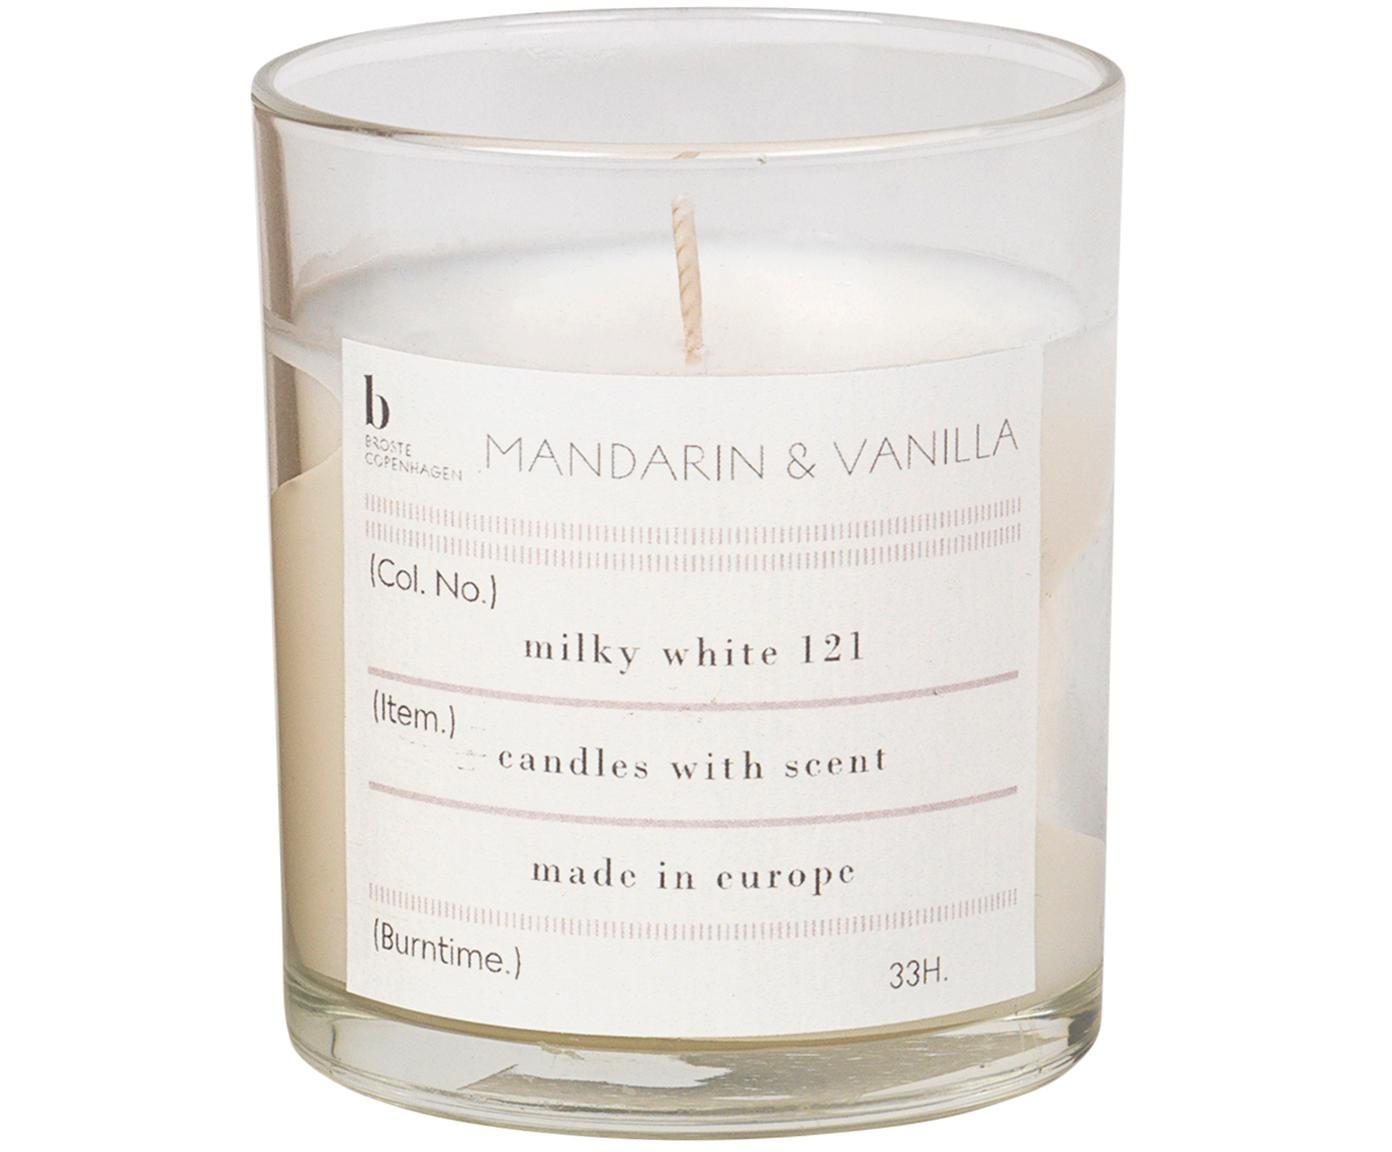 Geurkaars Mandarin (mandarijn, vanille), Houder: glas, Houder: transparant. Geurkaars: wit, Ø 7 x H 8 cm